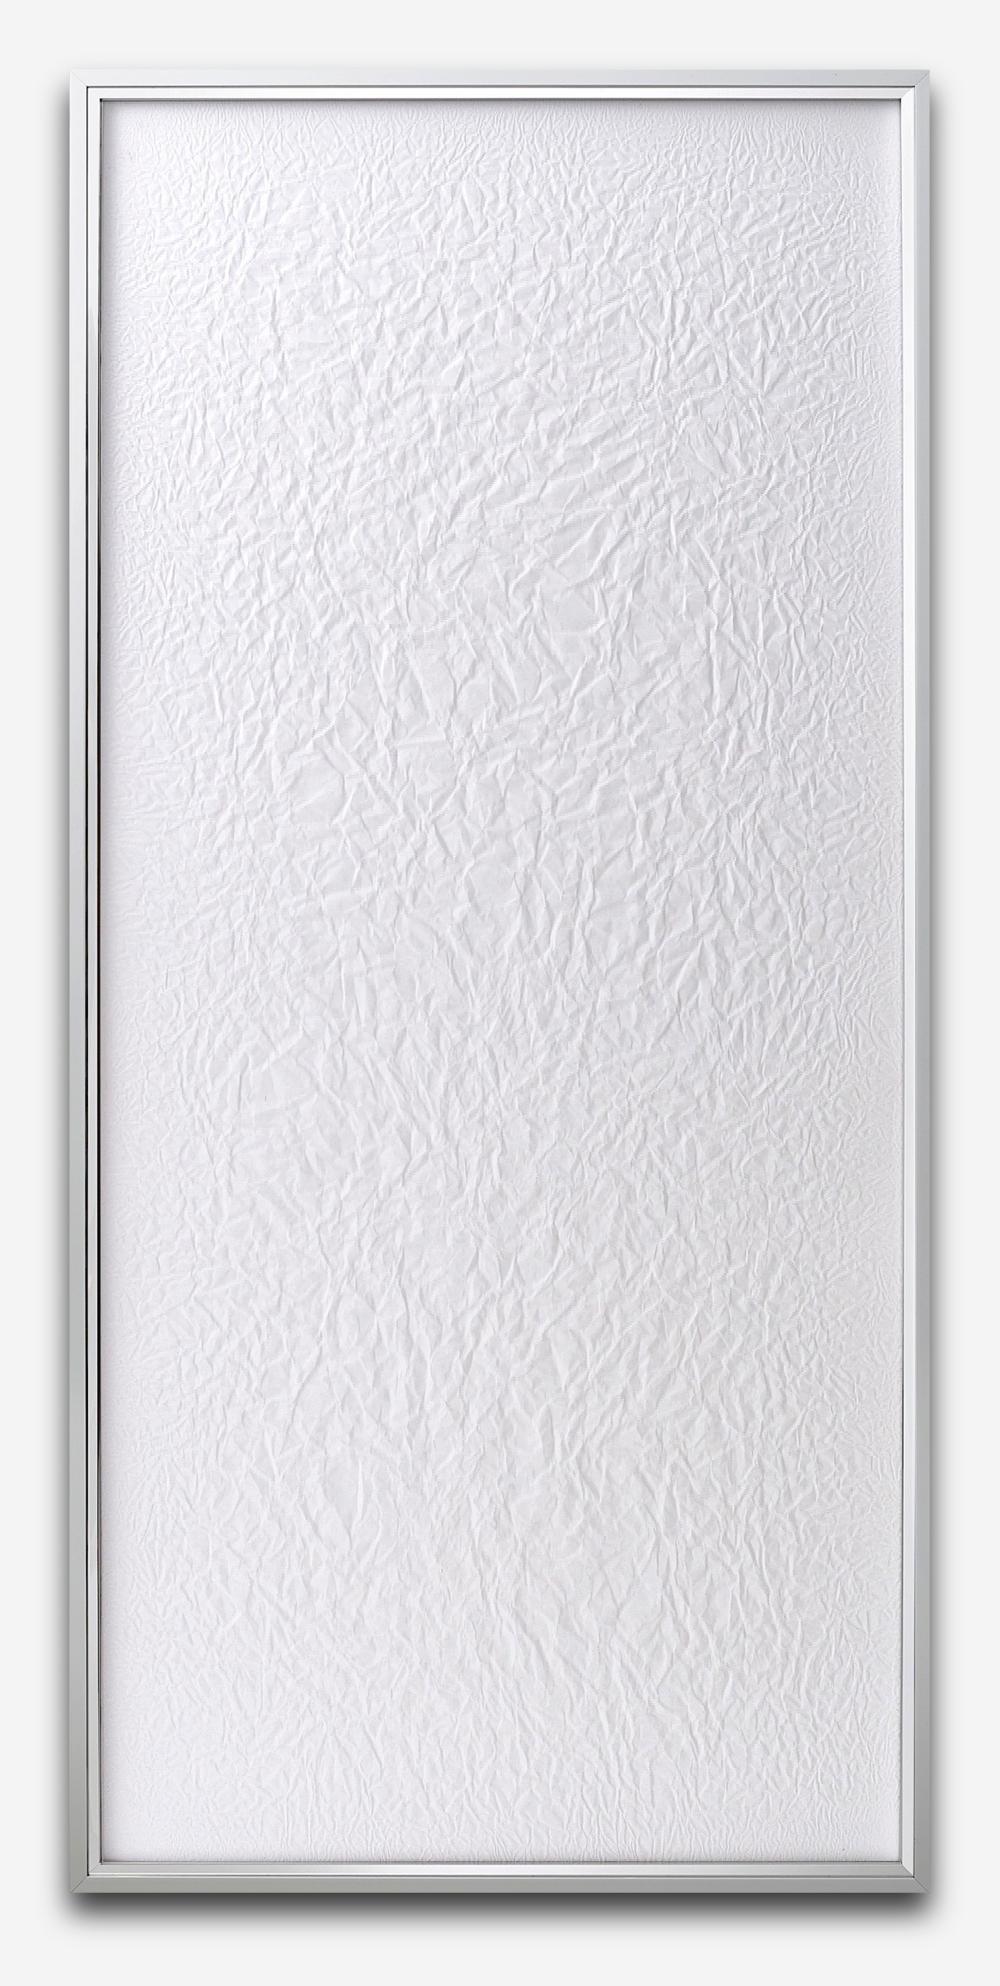 Tabula Rasa / Part I,  2016 Mulberry Hanji paper on wood beneath structured Plexiglas, aluminium frame 152 x 72 cm (60 x 28 in)